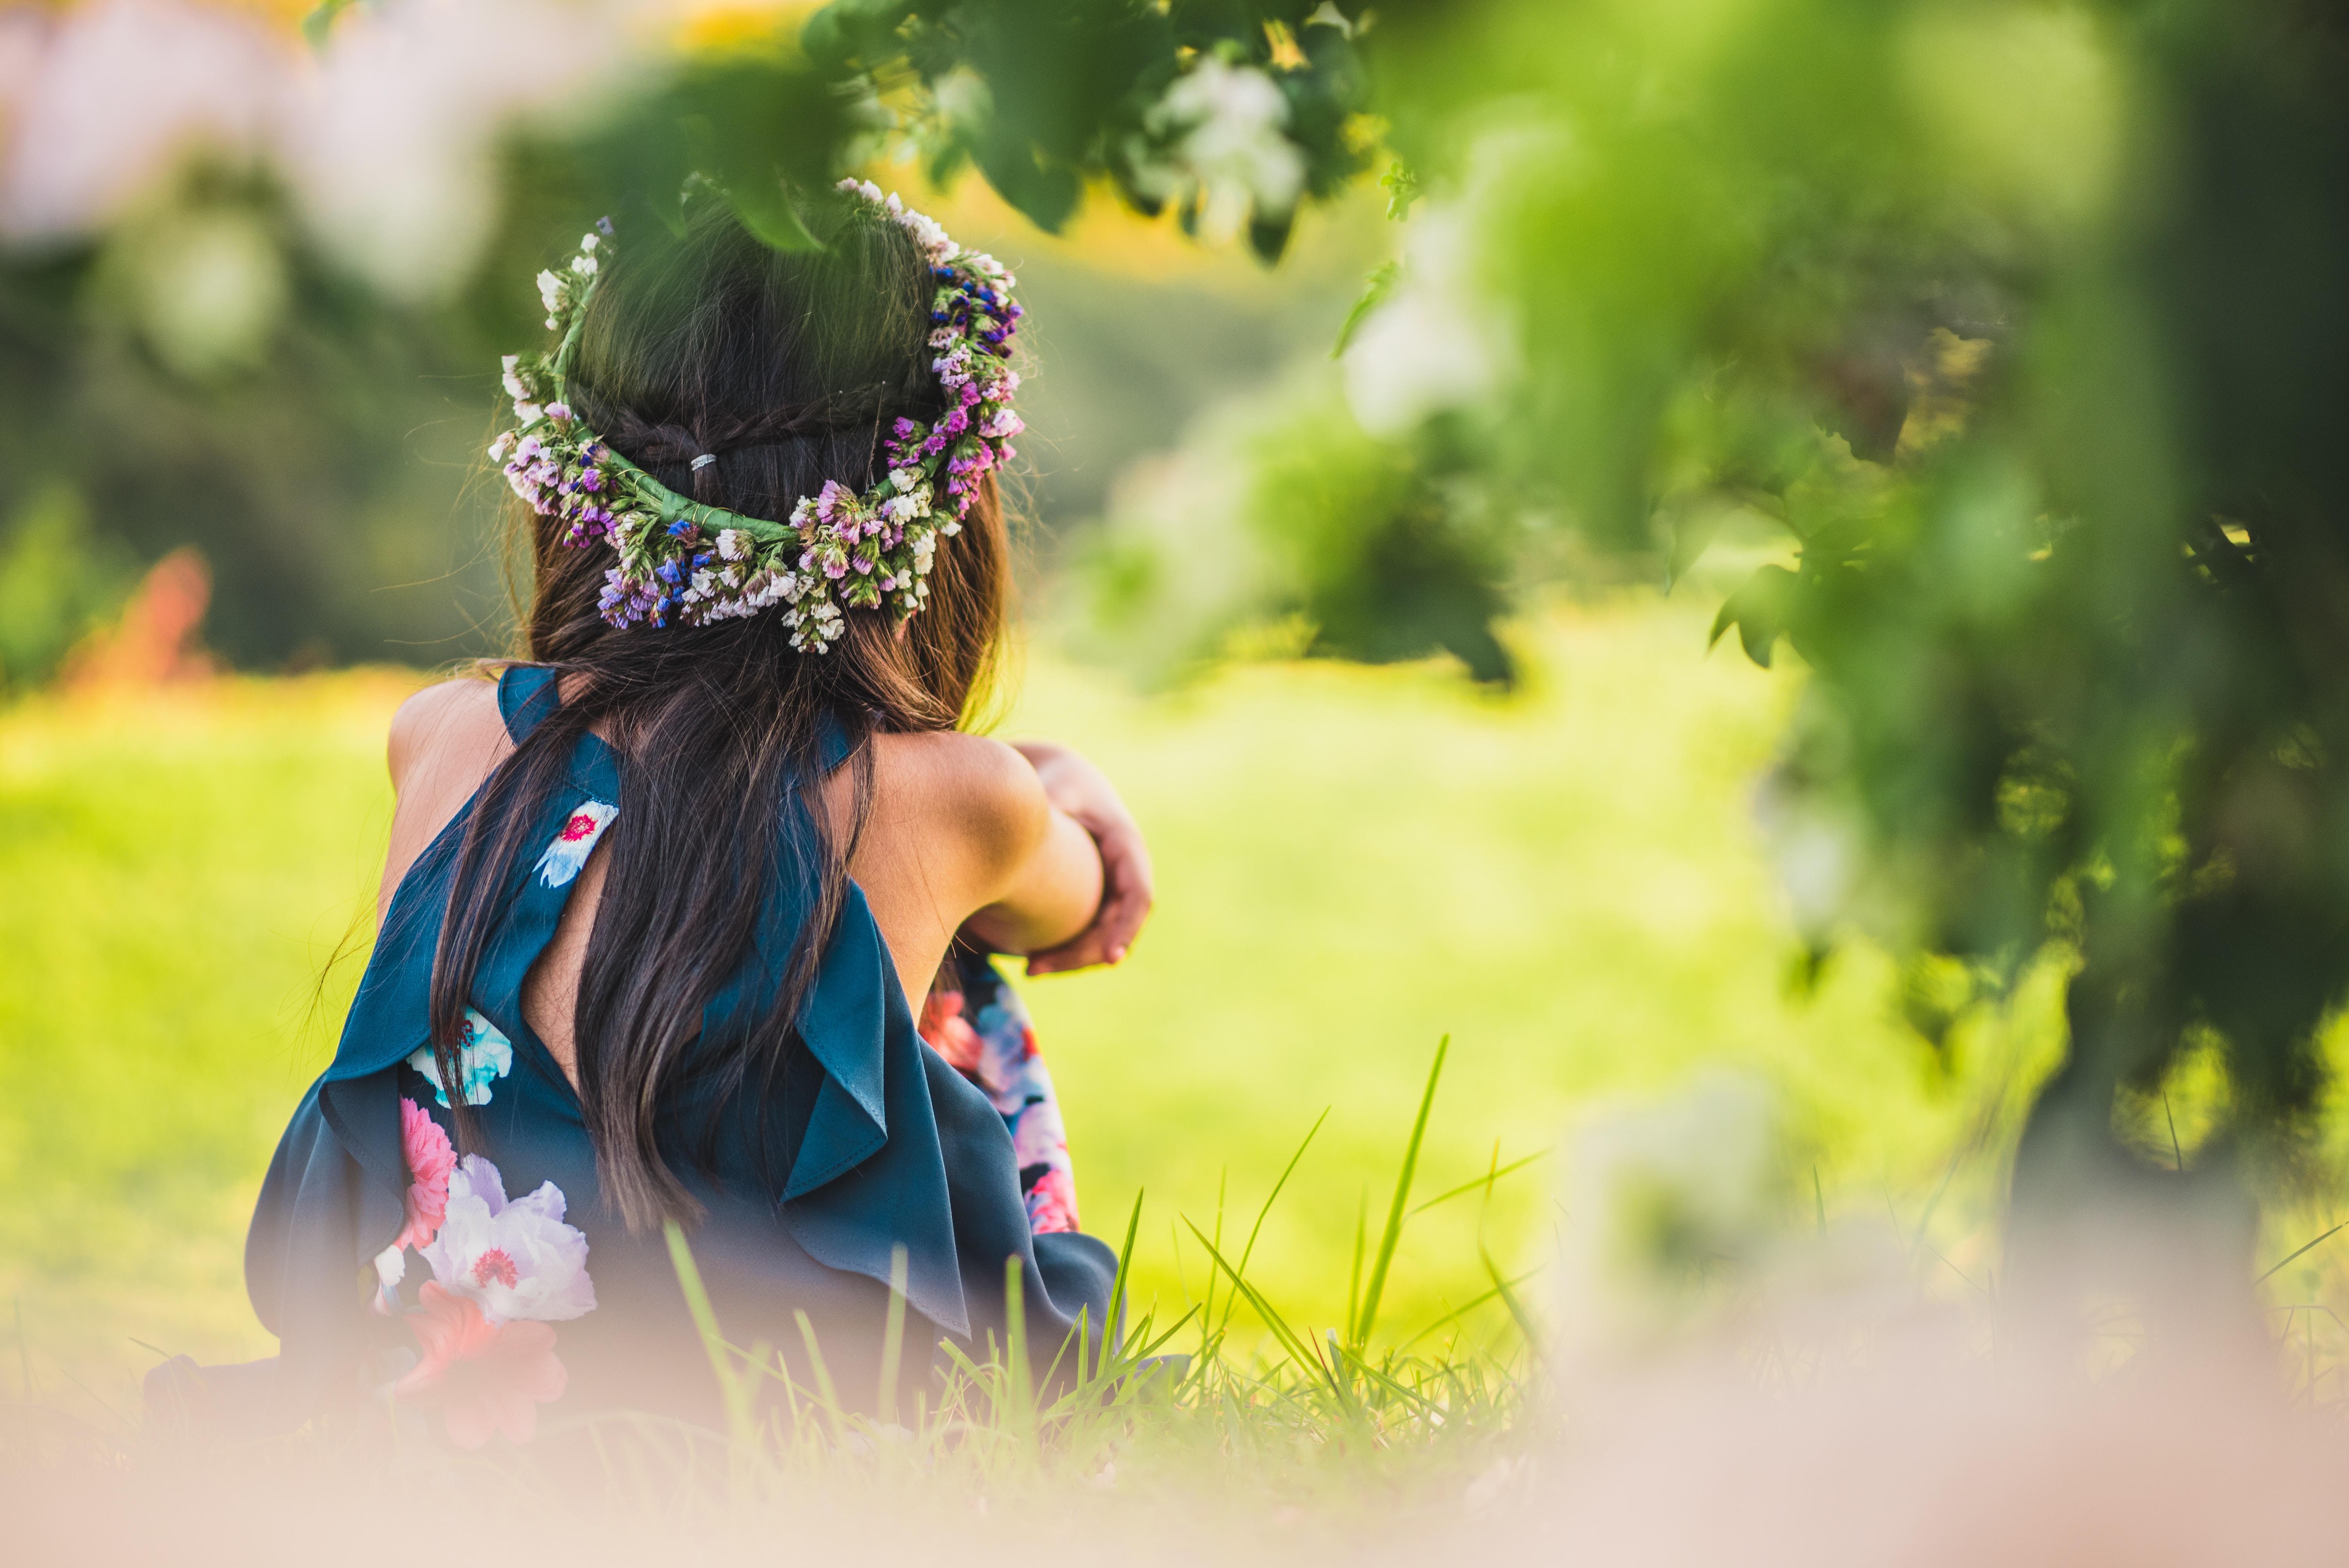 girl wearing blue floral dress sitting near green grass during daytime